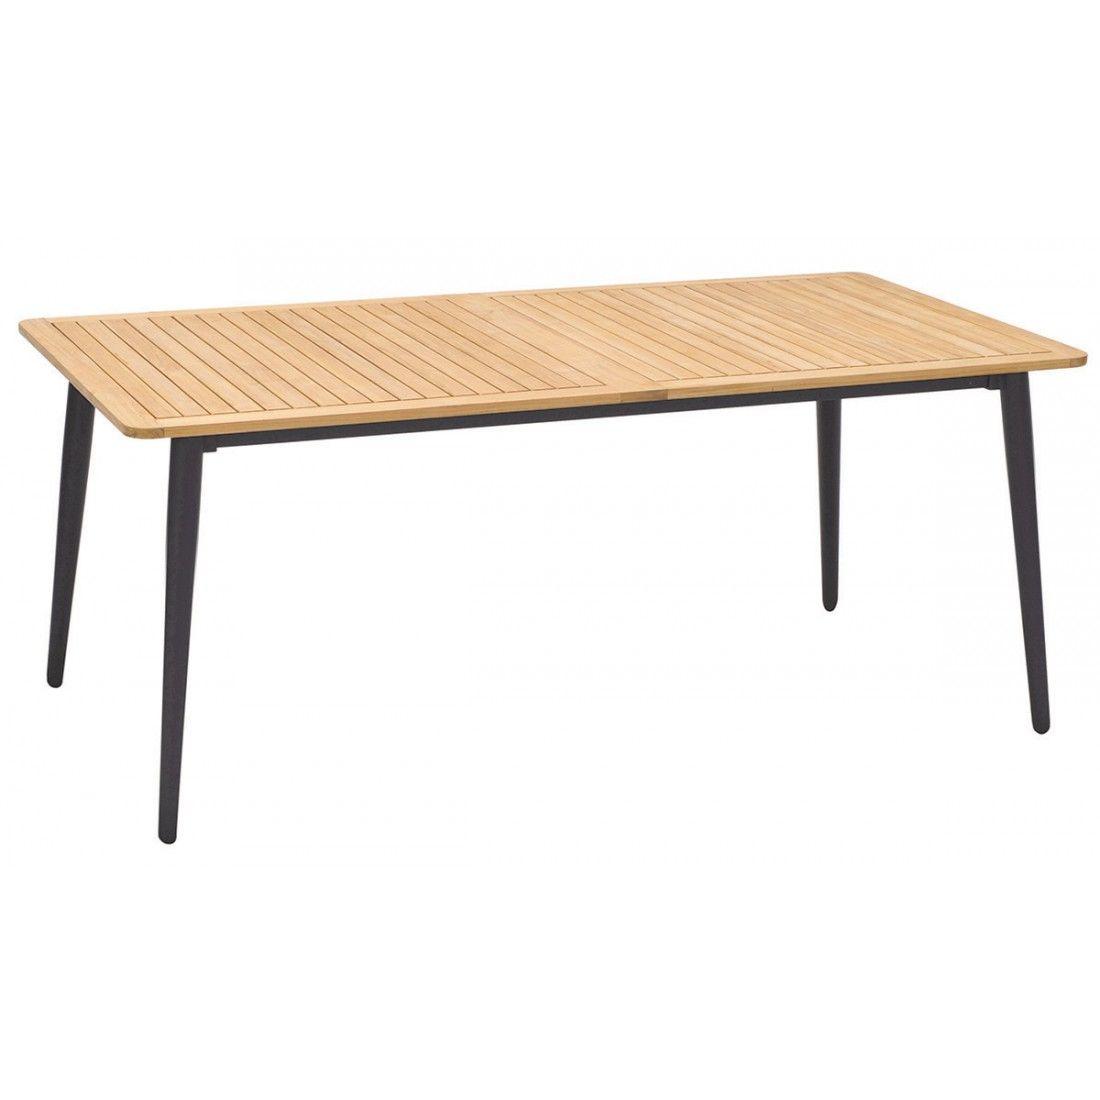 Table en teck massif et alu 185 cm, Enzo